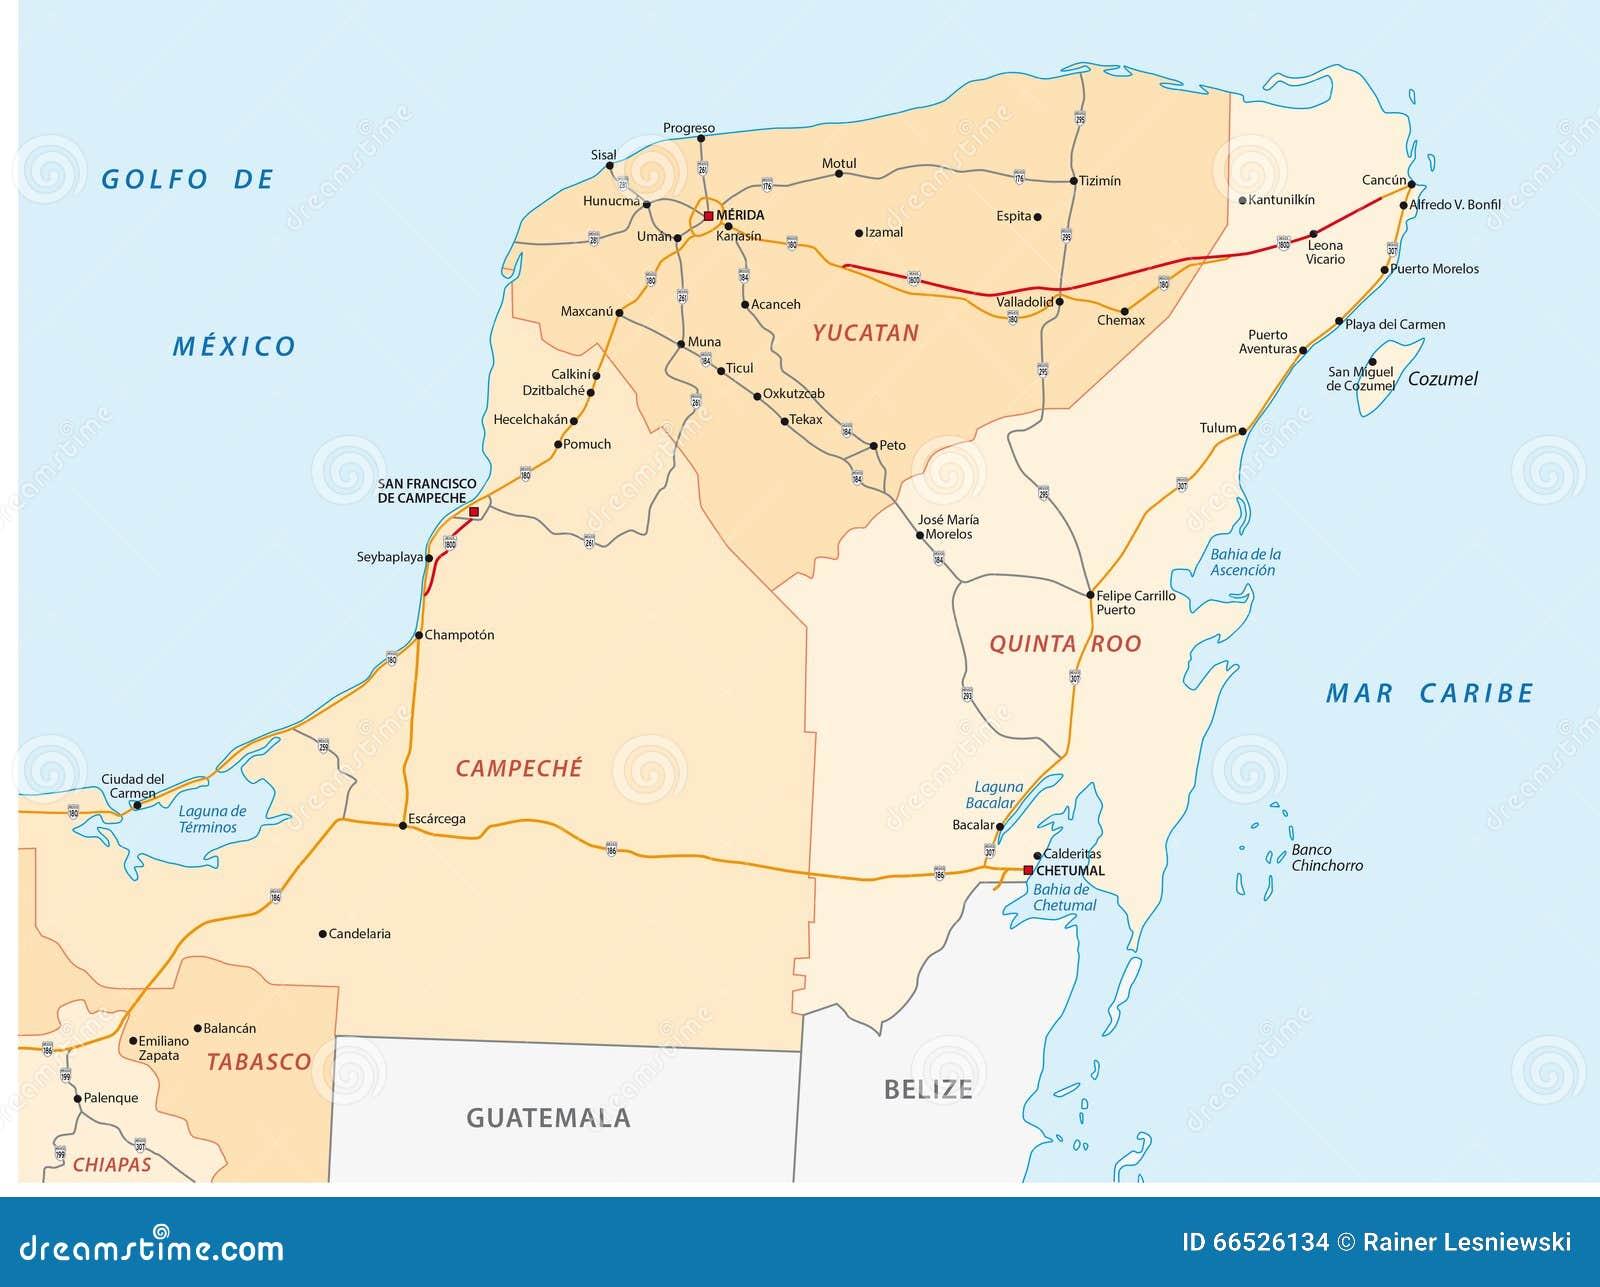 Yucatan peninsula road map stock illustration. Illustration of ...